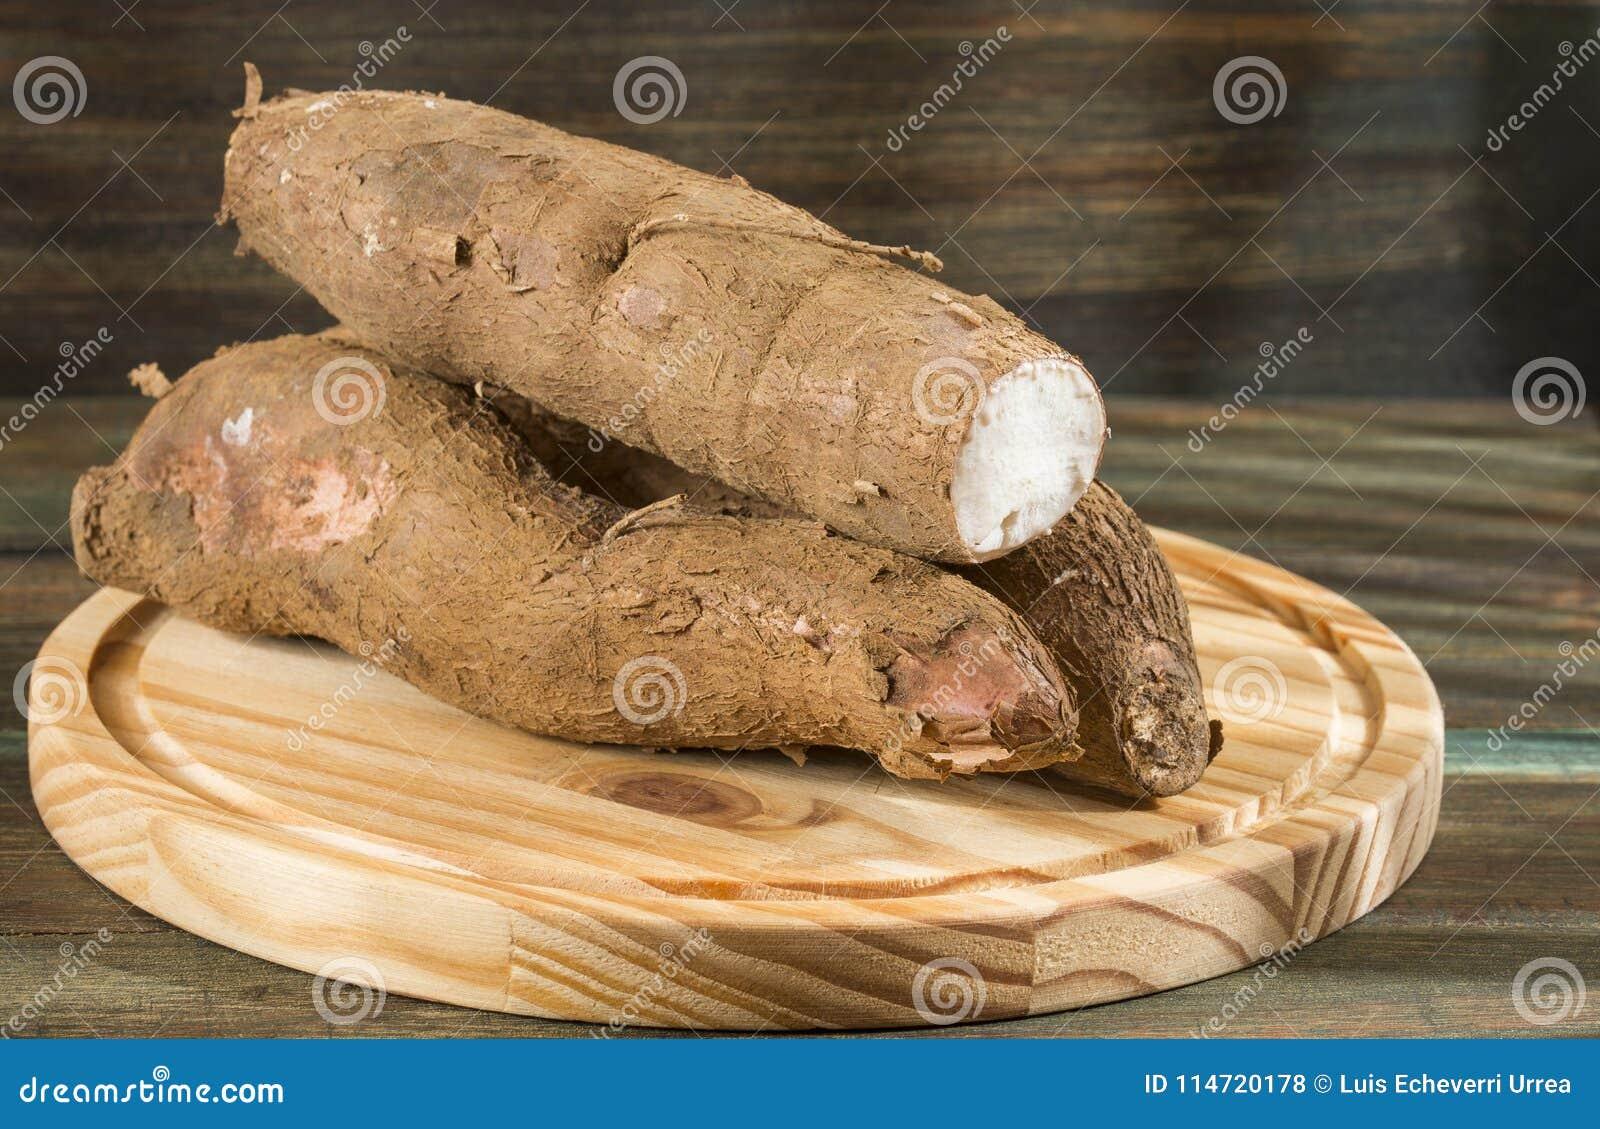 Cassava Raw Tuber - Manihot Esculenta Stock Photo